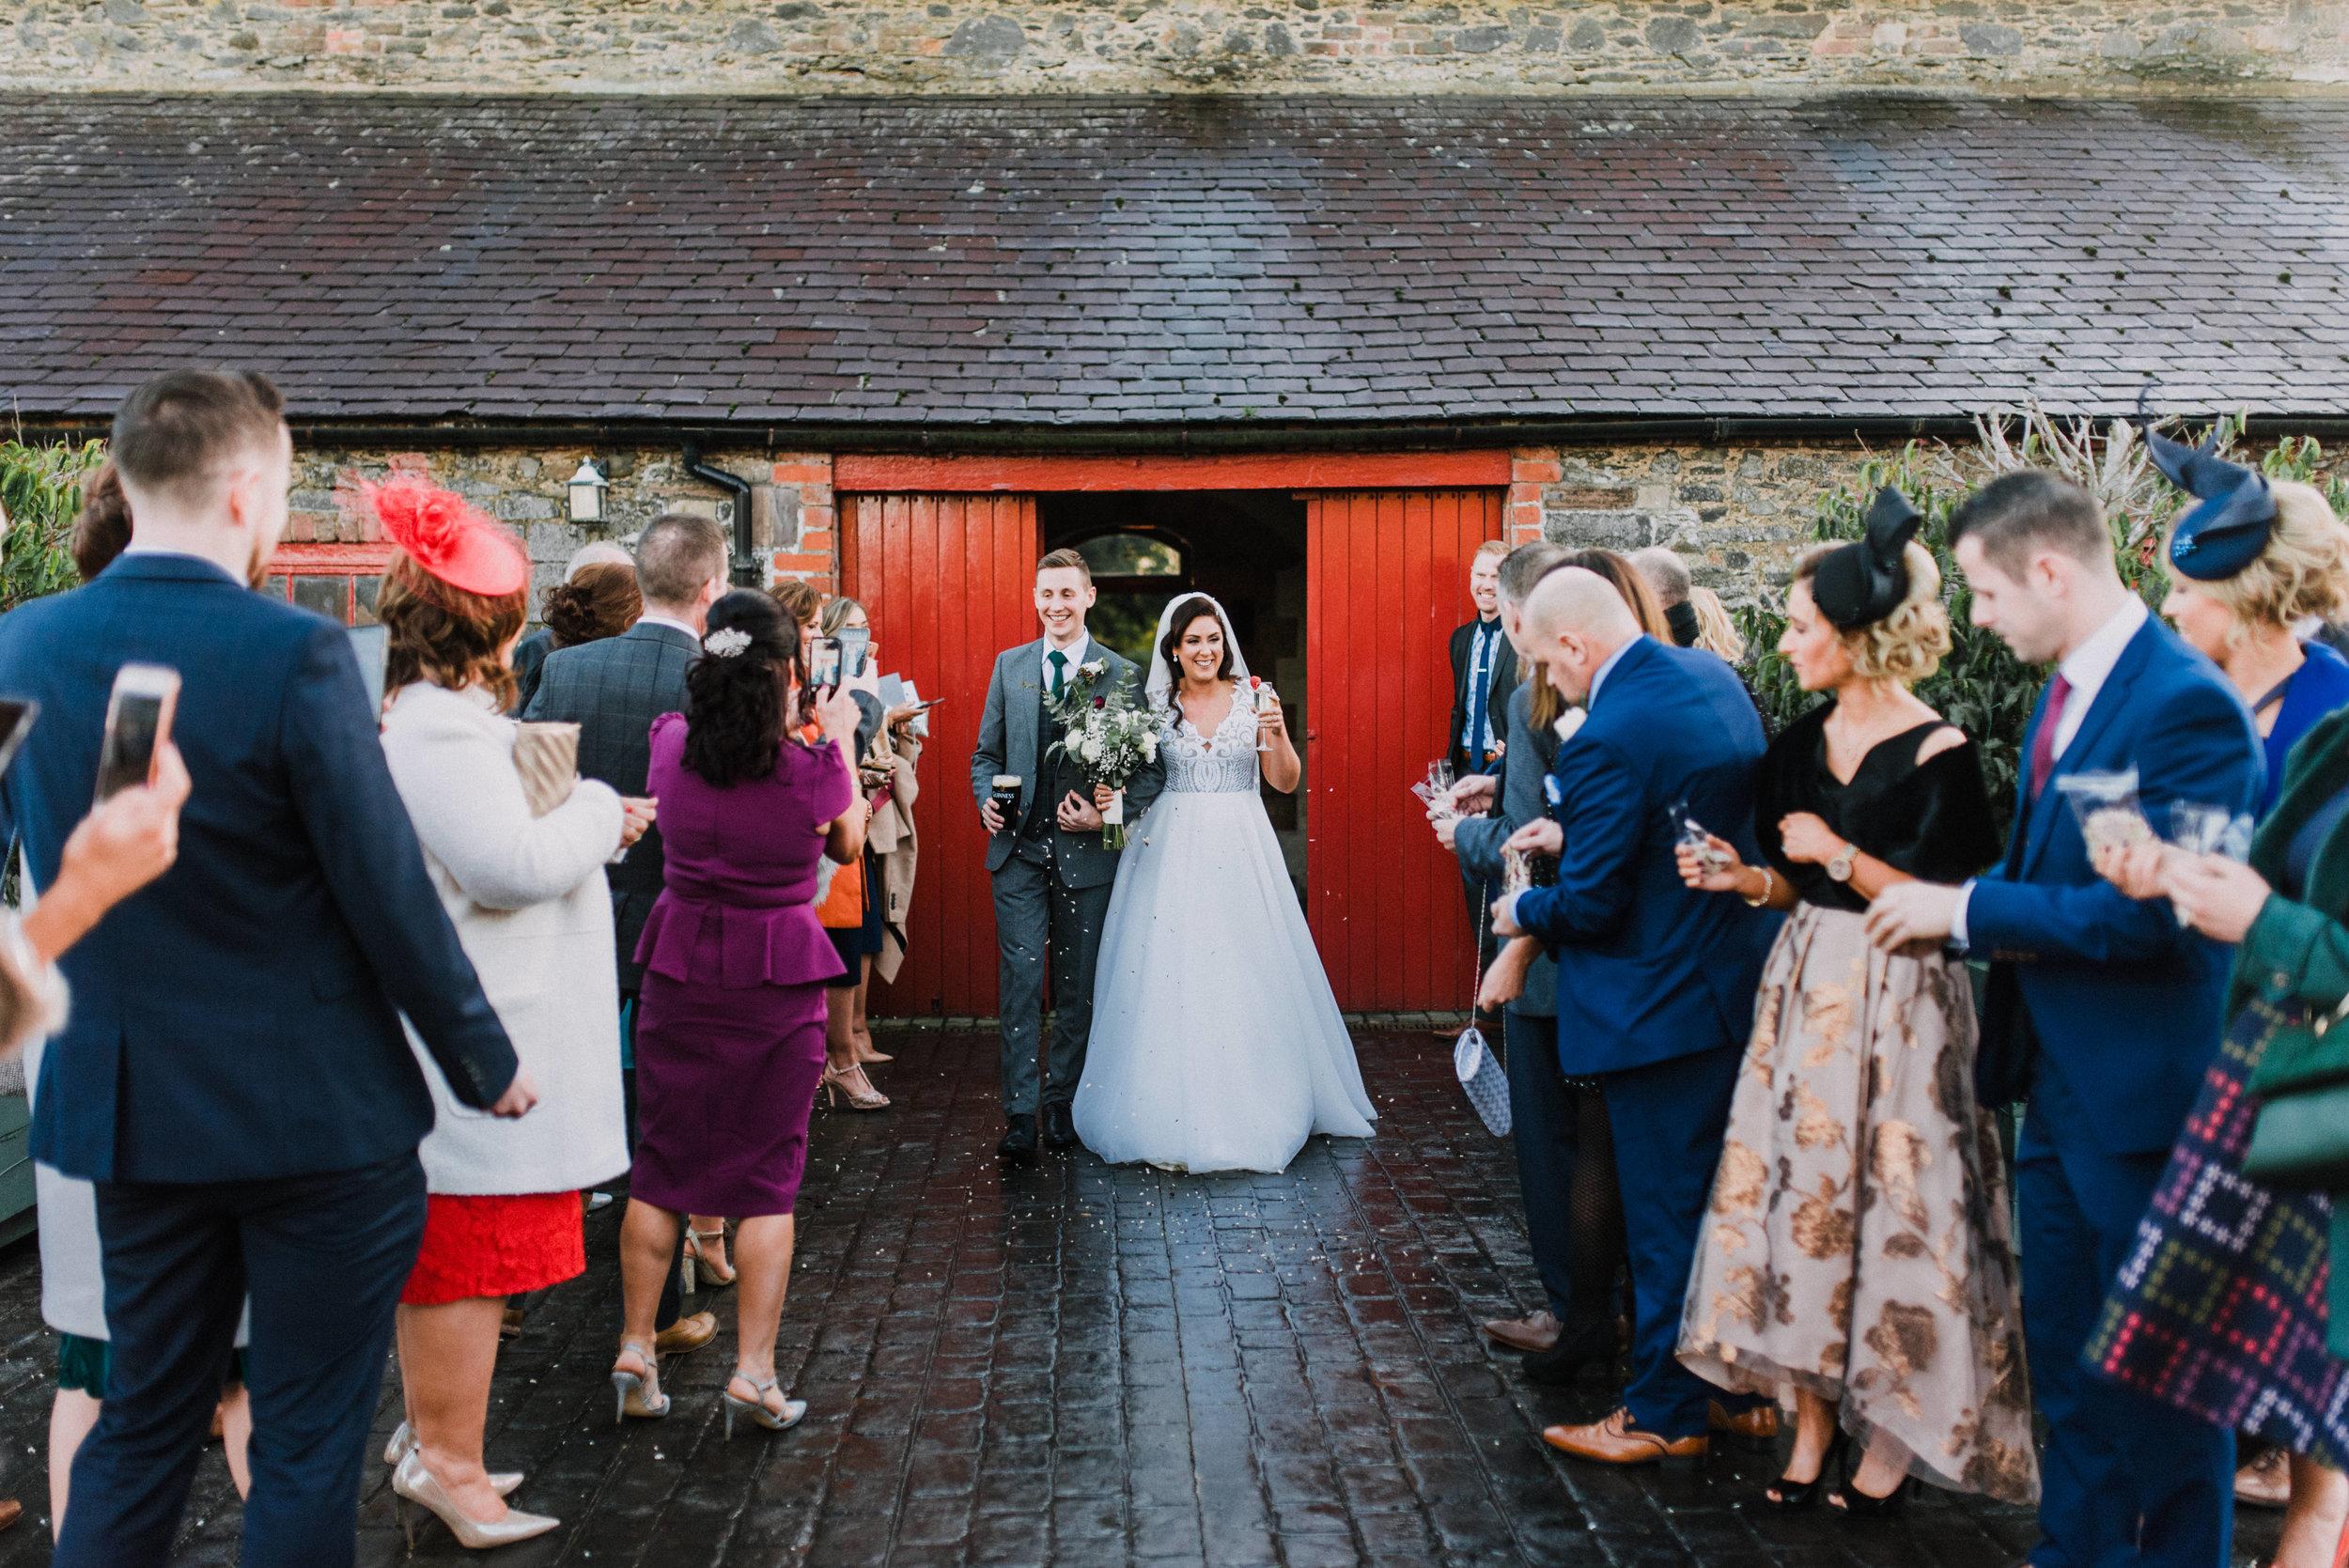 larchfield estate wedding, wedding venues northern ireland, barn wedding venues northern ireland, quirky weddings ni, wedding photos larchfield estate, shane todd's wedding (2).jpg